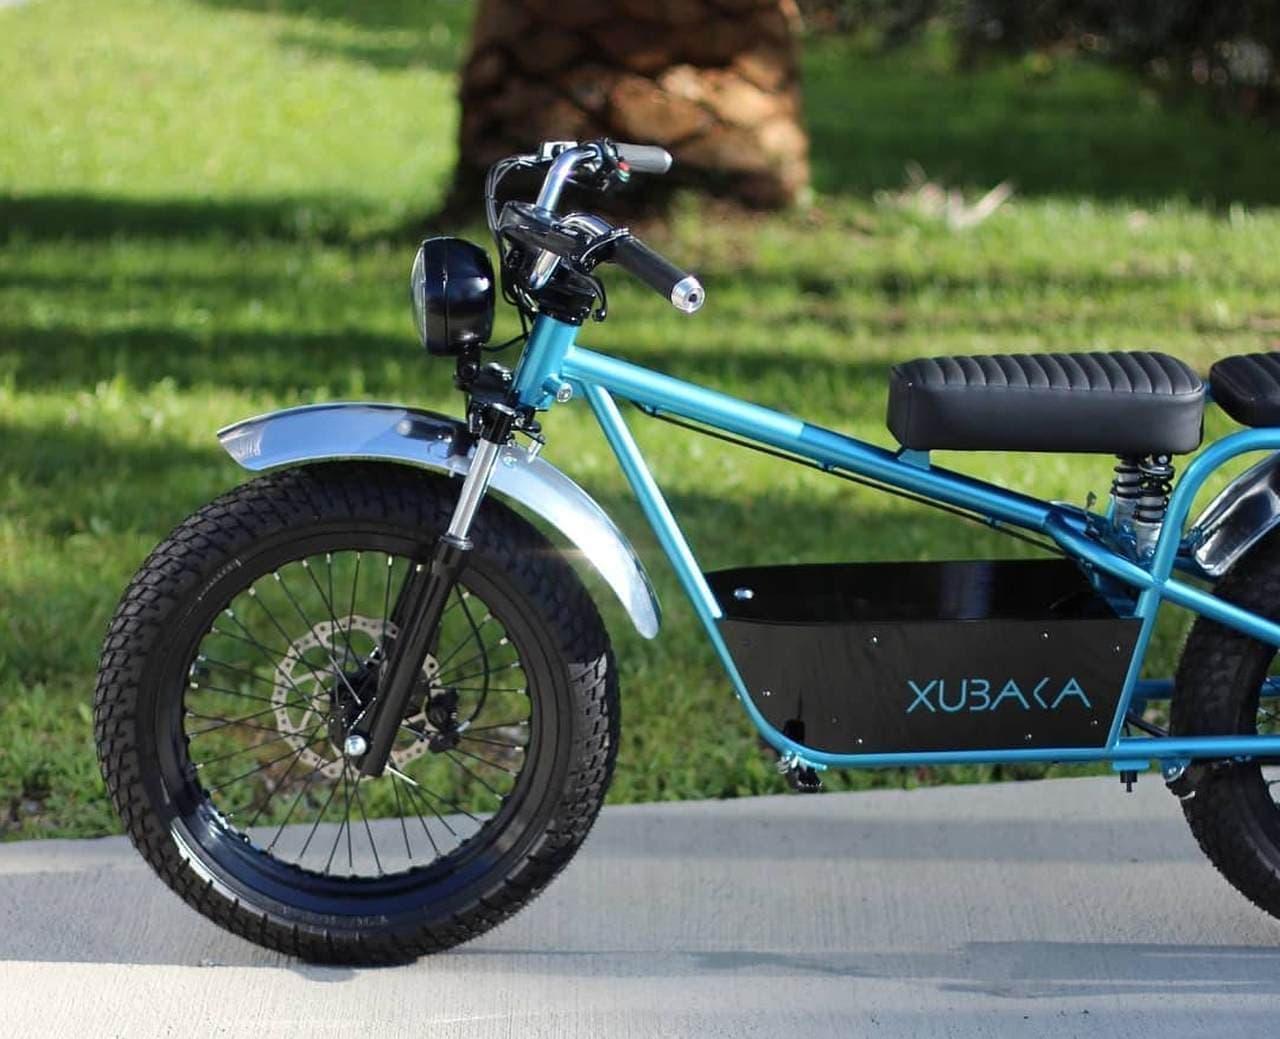 Sodium Cyclesの電動バイク「Xubaka」 ― ナトリウムイオン電池の実用化を目指して